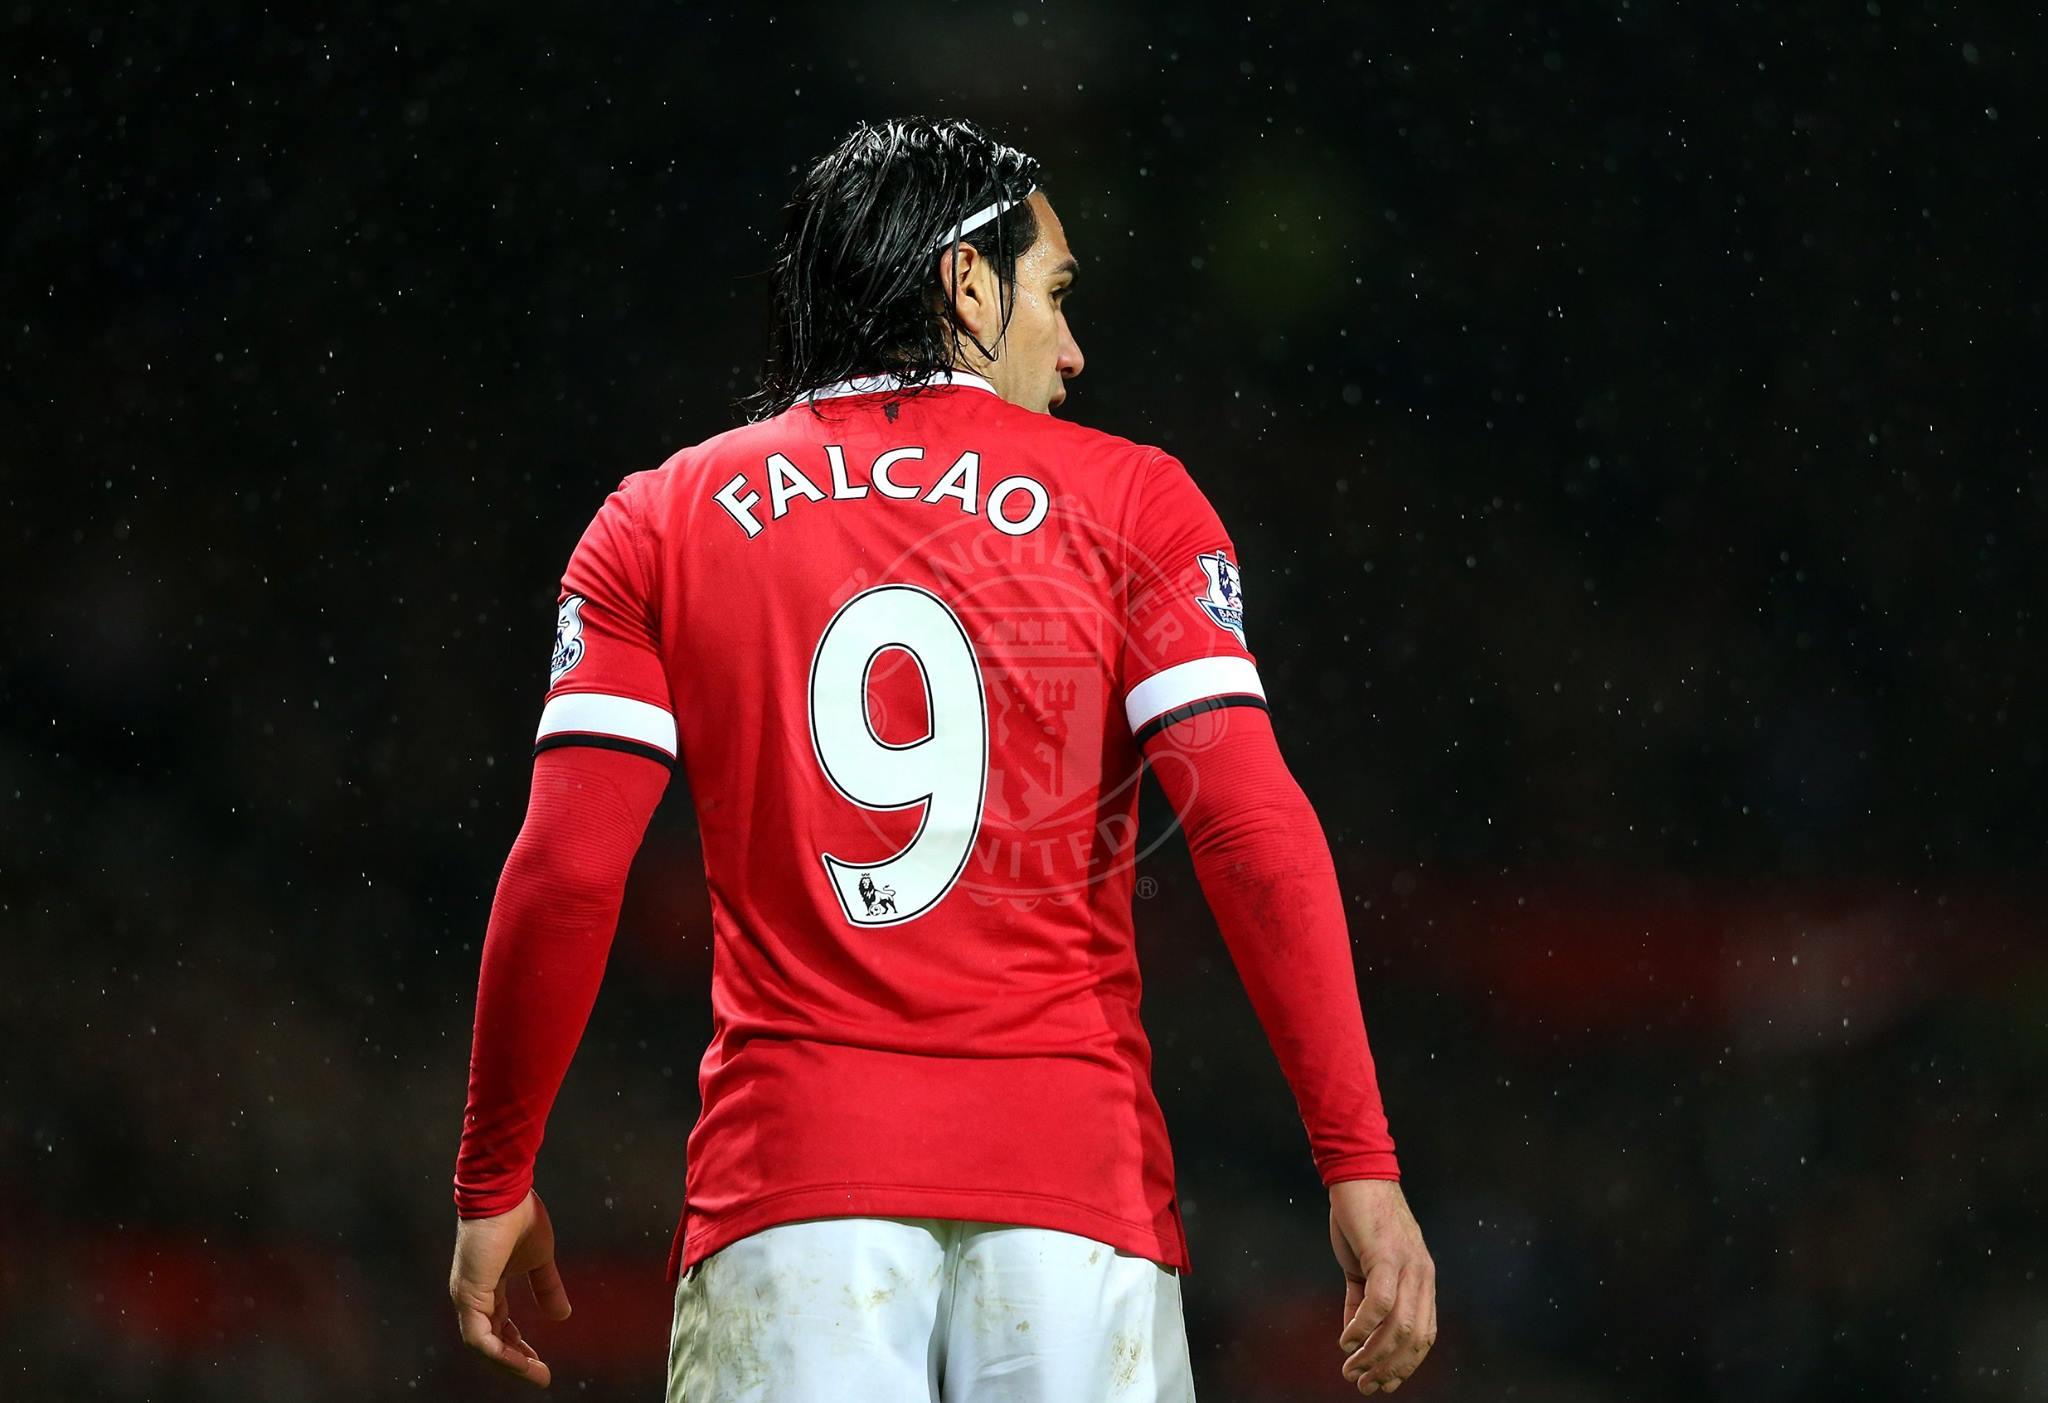 Falcao promete que los goles llegarán pronto